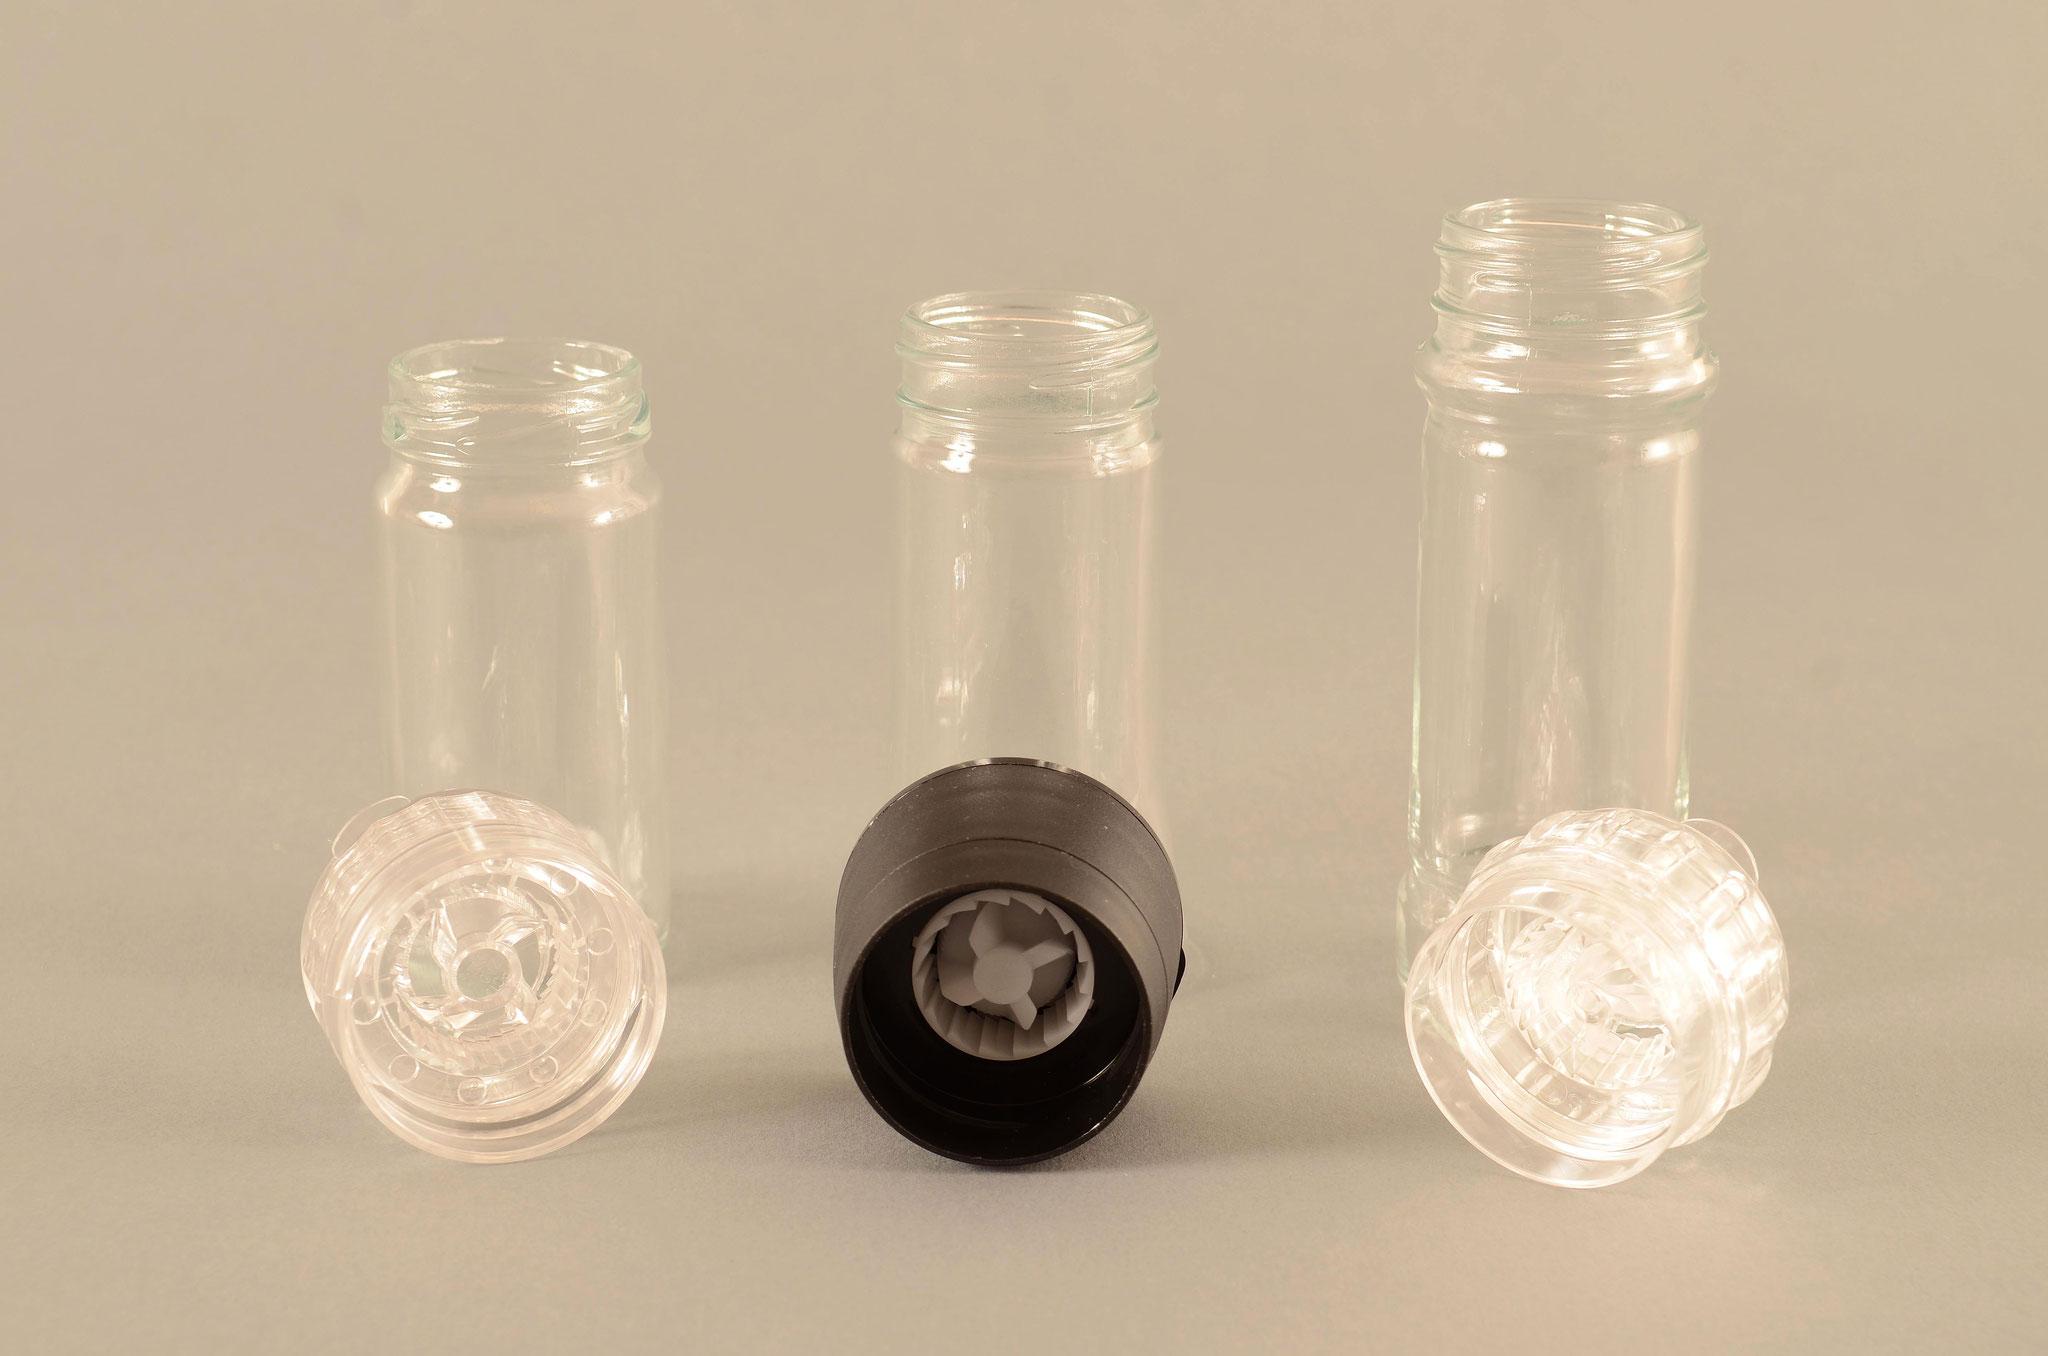 Aus dem TREFFPACK Sortiment - Gläser und Mahlwerke